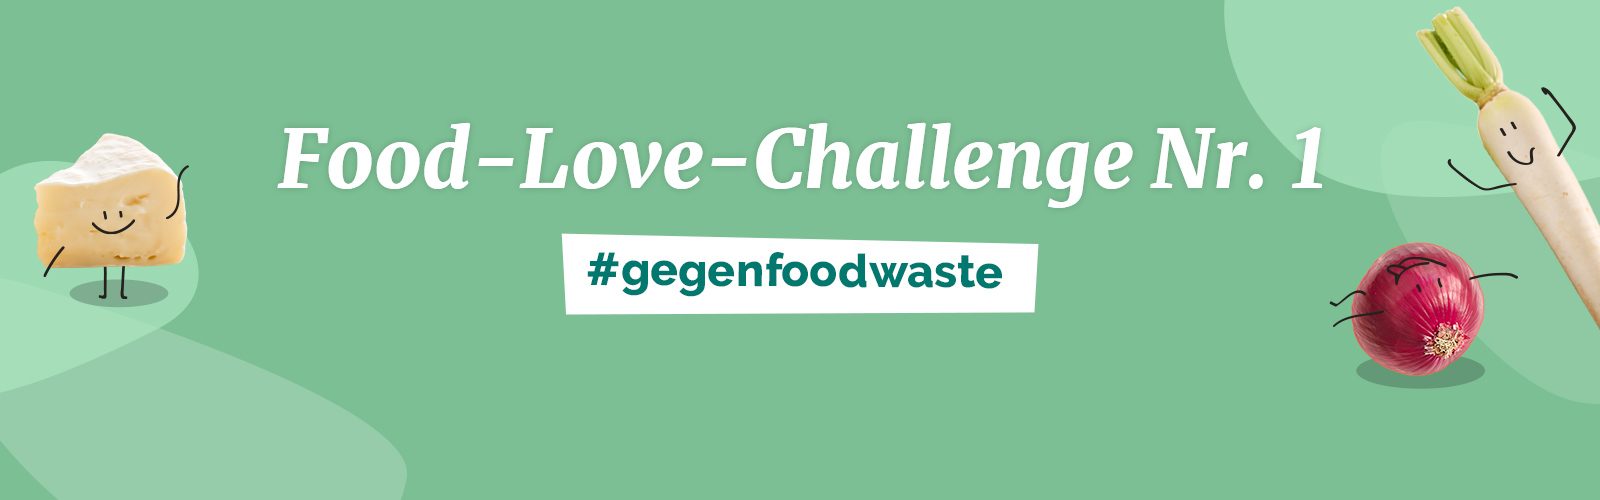 Food Love Challenge Nr. 1